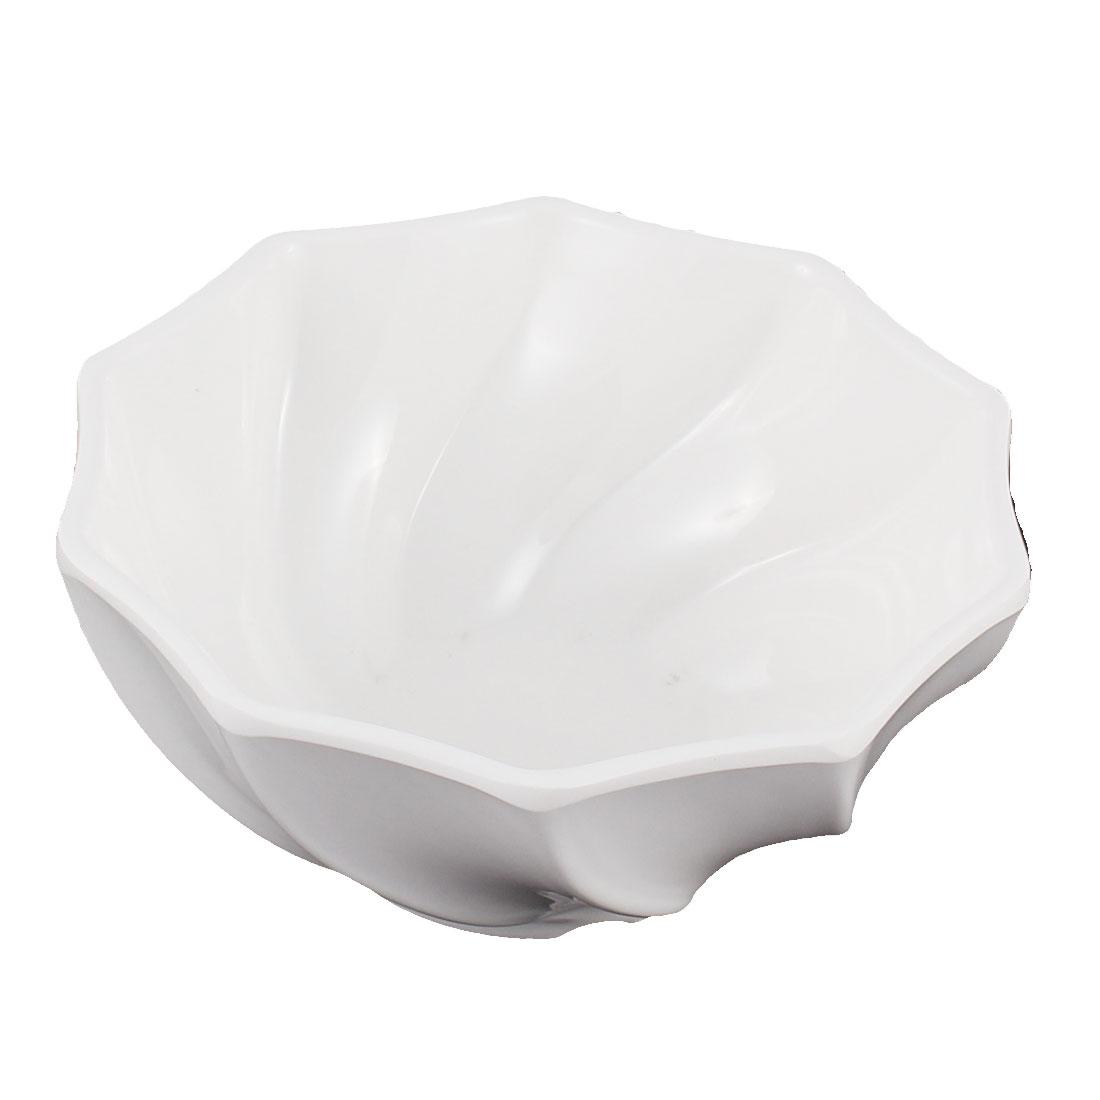 Restaurant Tableware Wavy Edge Salad Soup Serving Bowl White